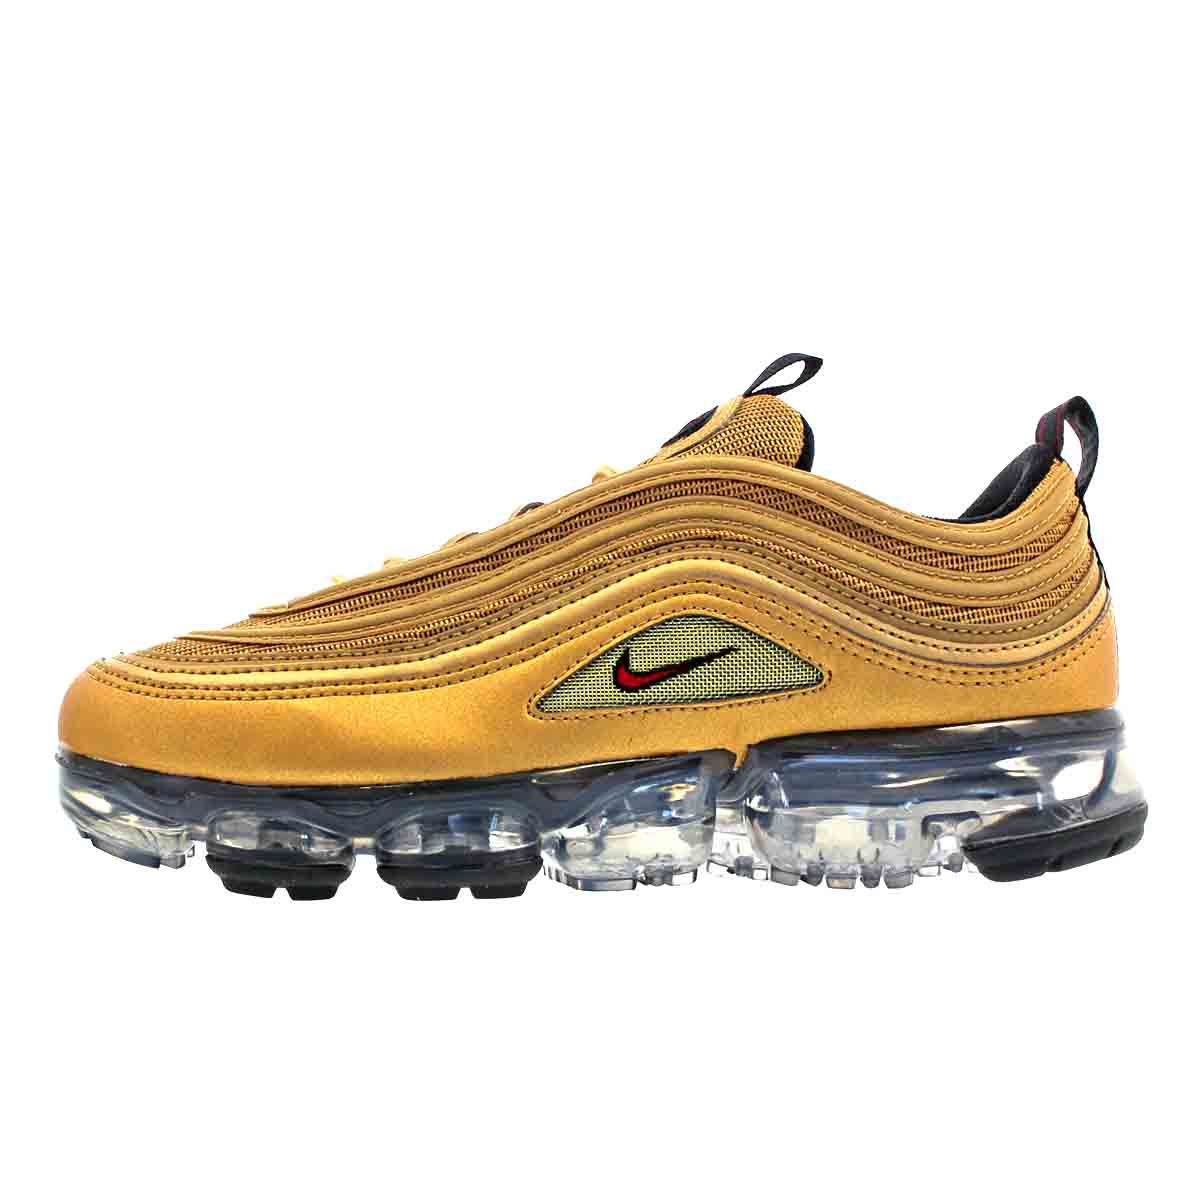 Nike Air Max '97 Vapormax GS AQ2657 700 Metallic Gold